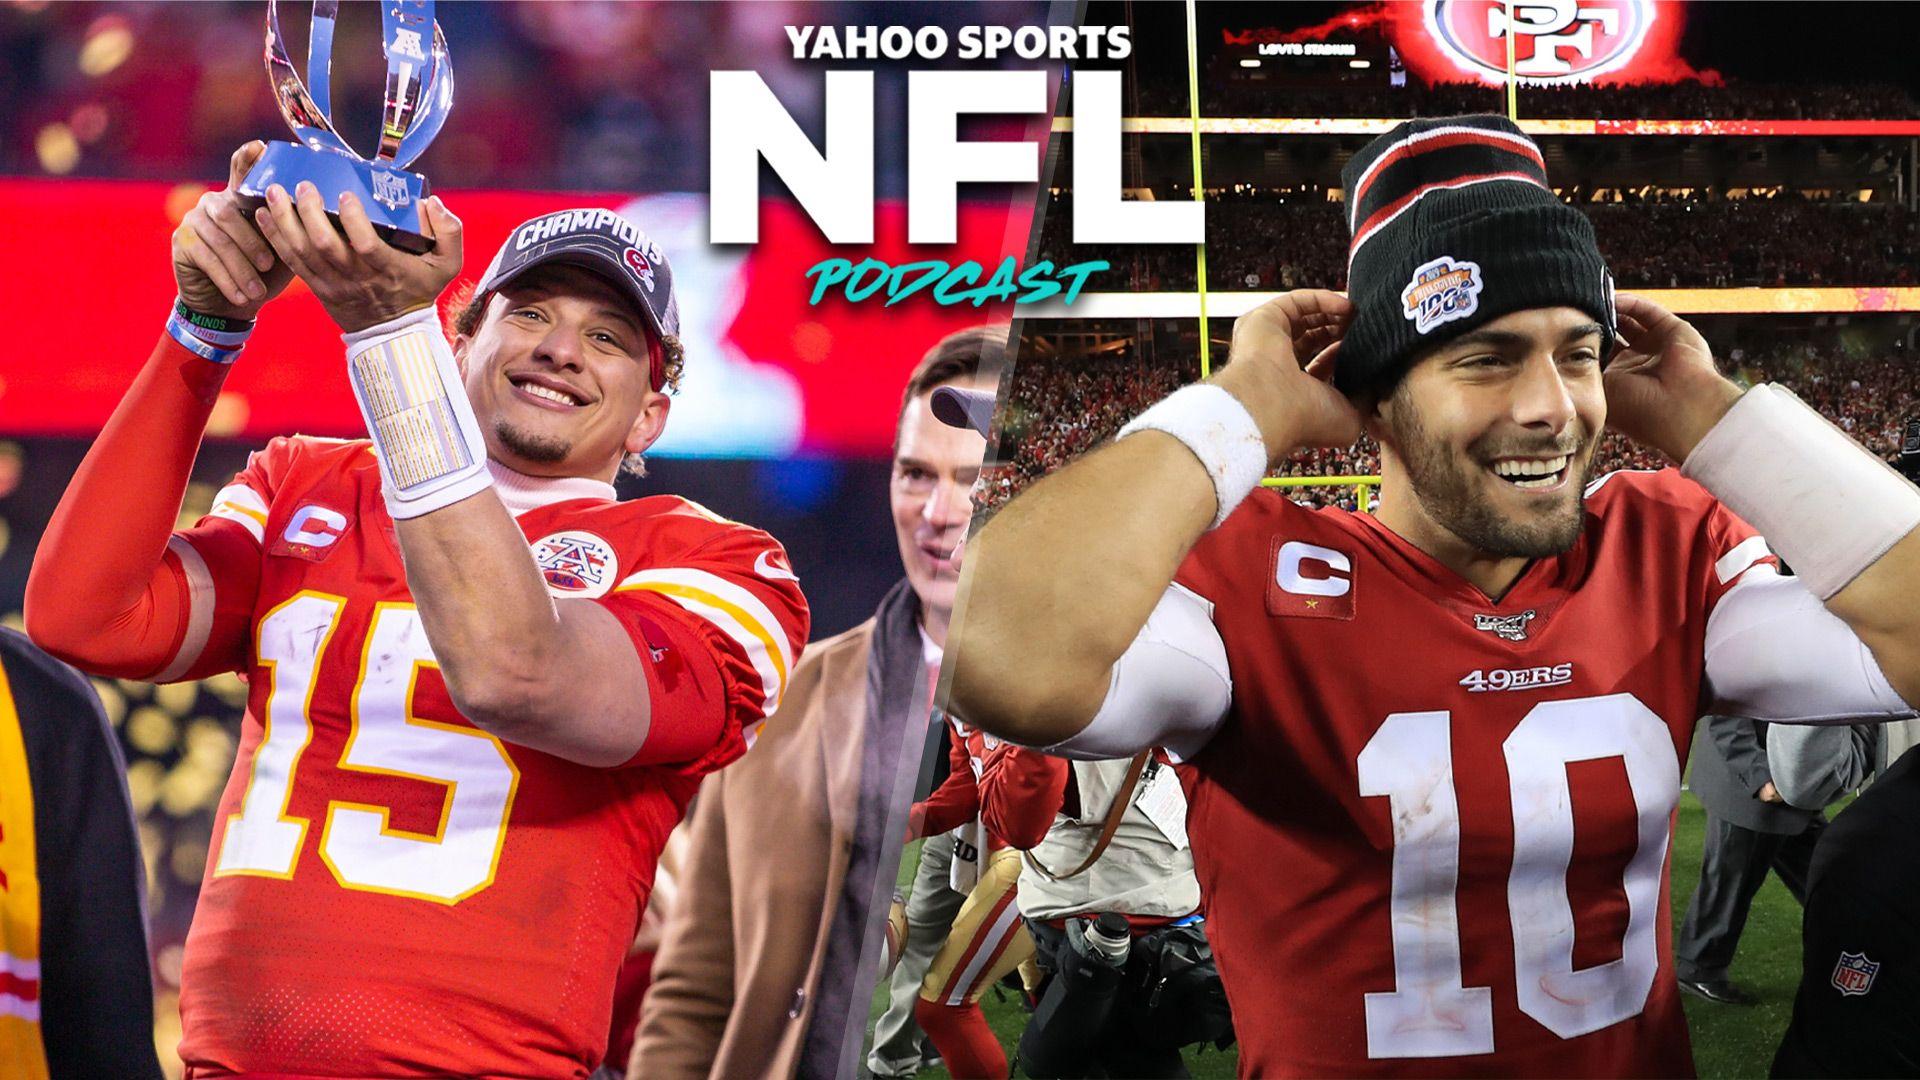 NFL Podcast Chiefs 49ers convincingly advance to Super Bowl LIV 1920x1080